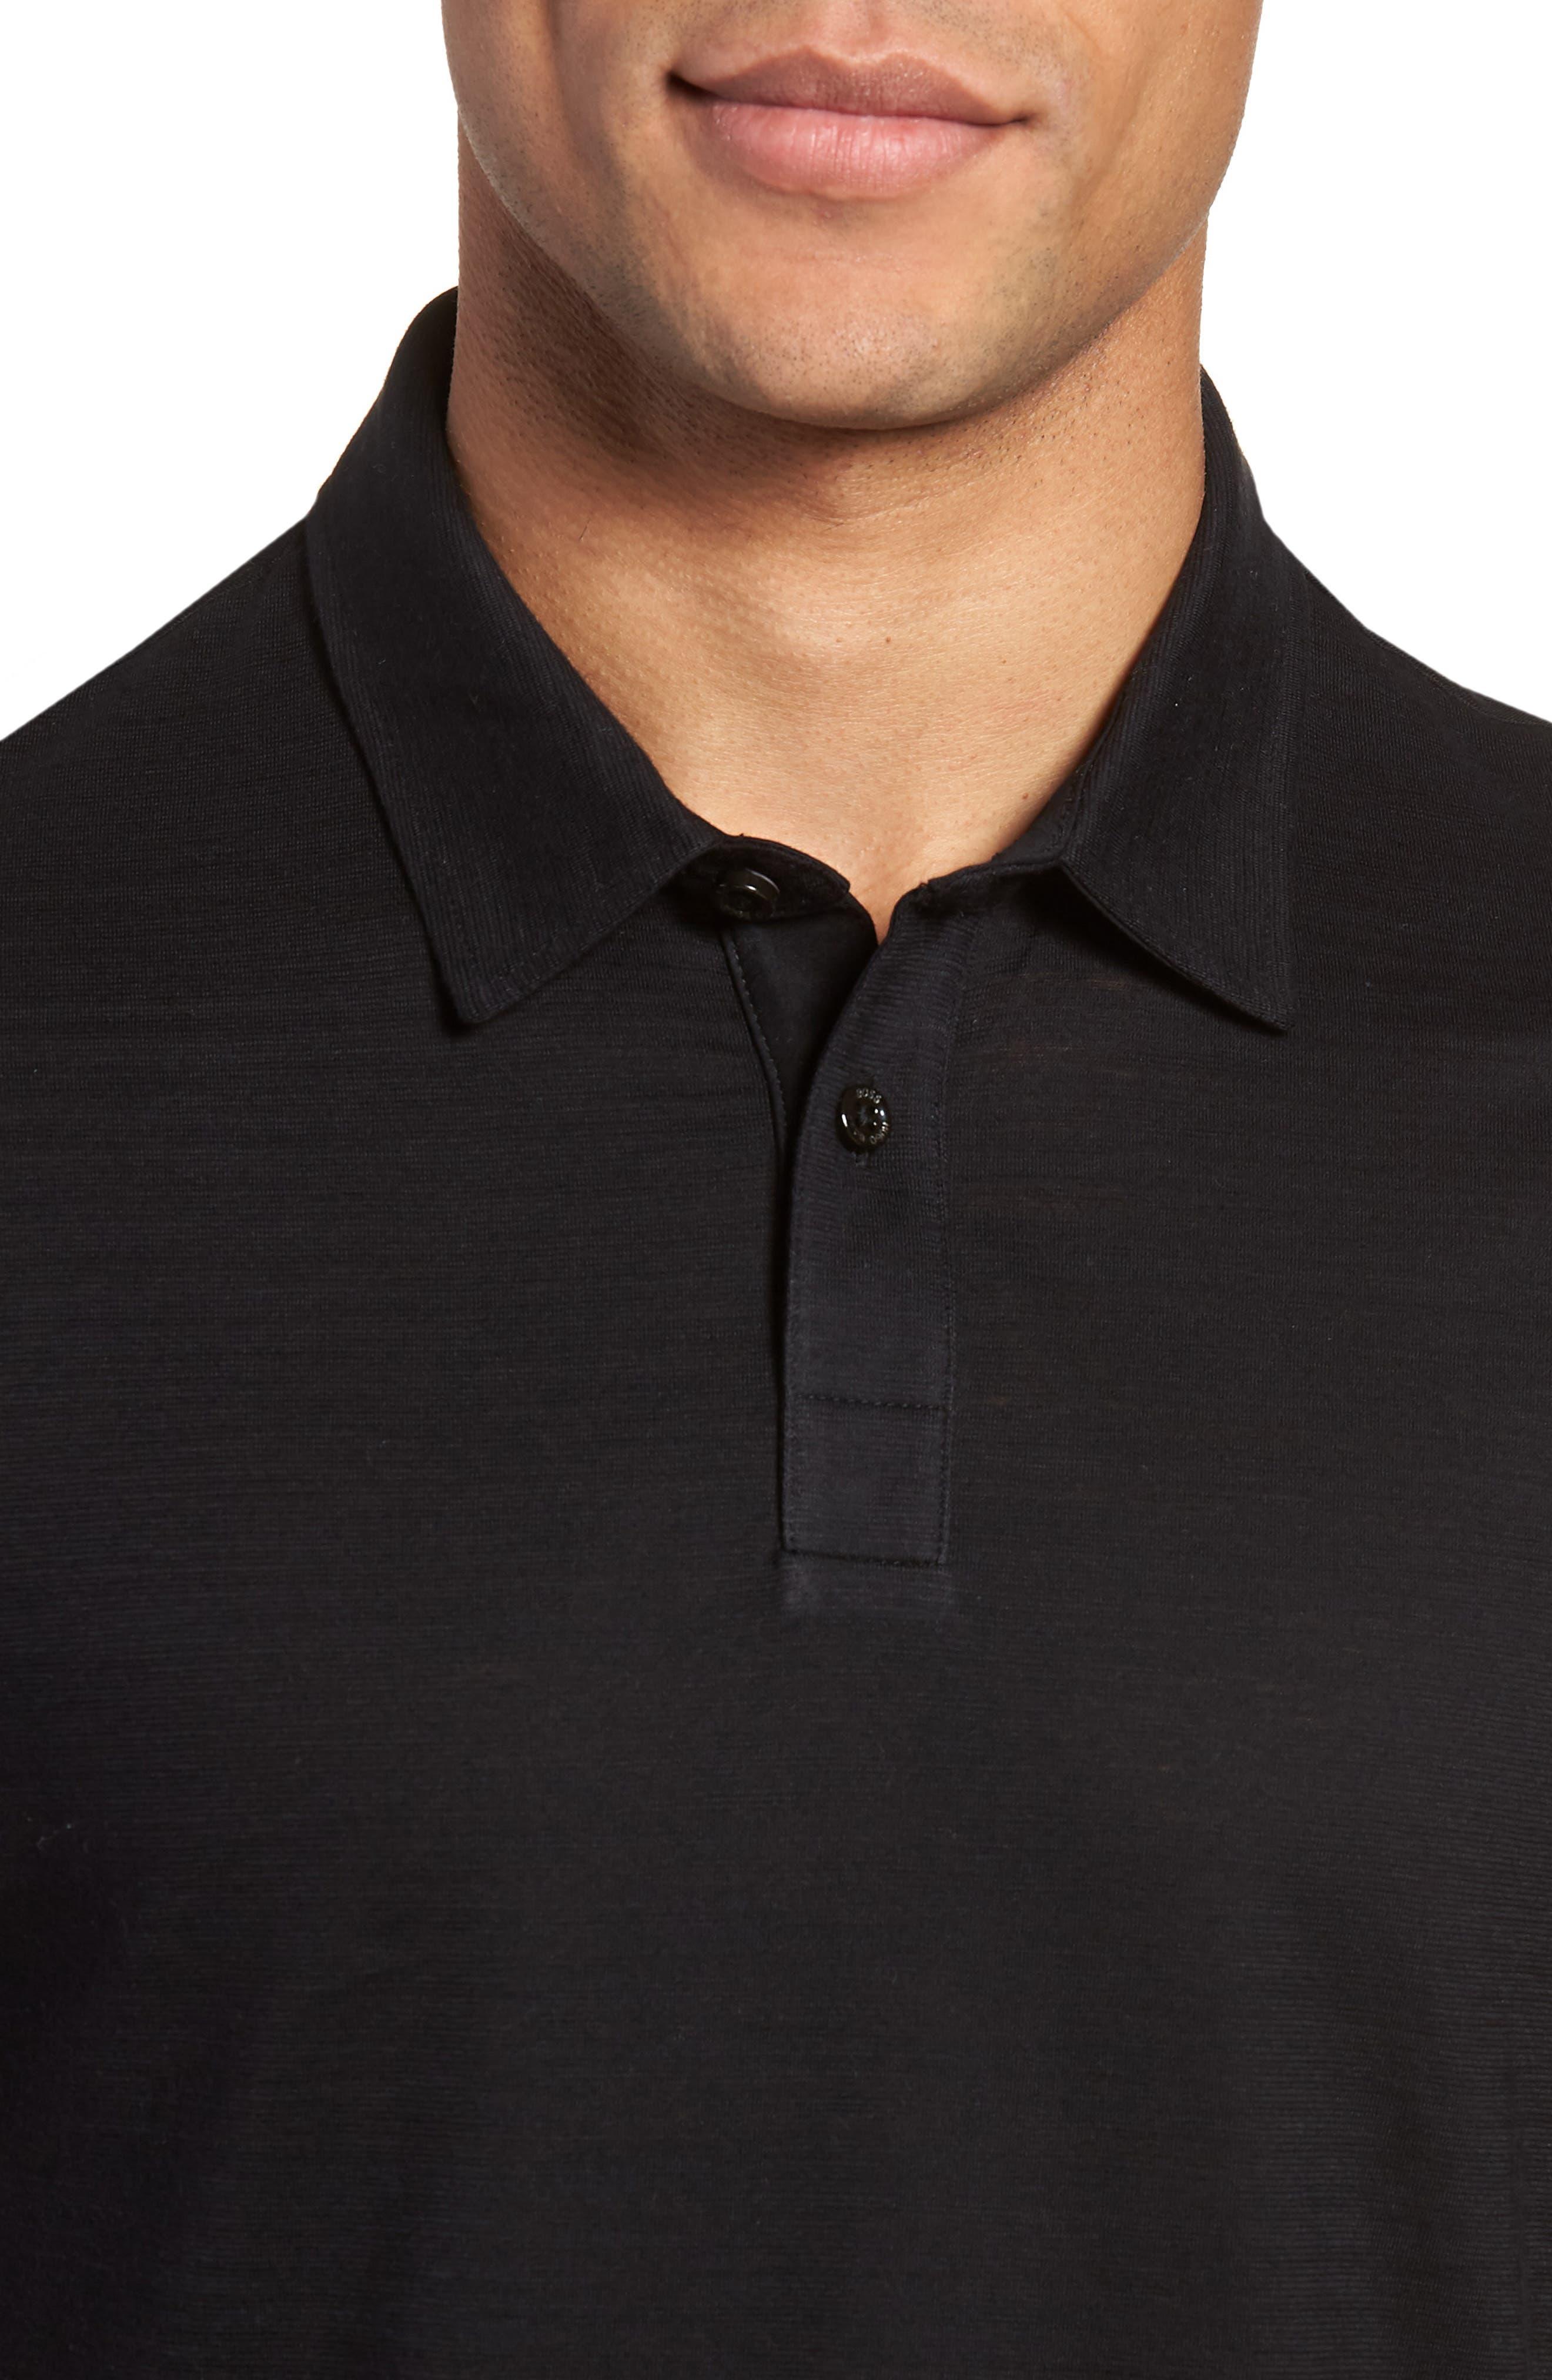 Press Flame Slim Fit Polo Shirt,                             Alternate thumbnail 4, color,                             001